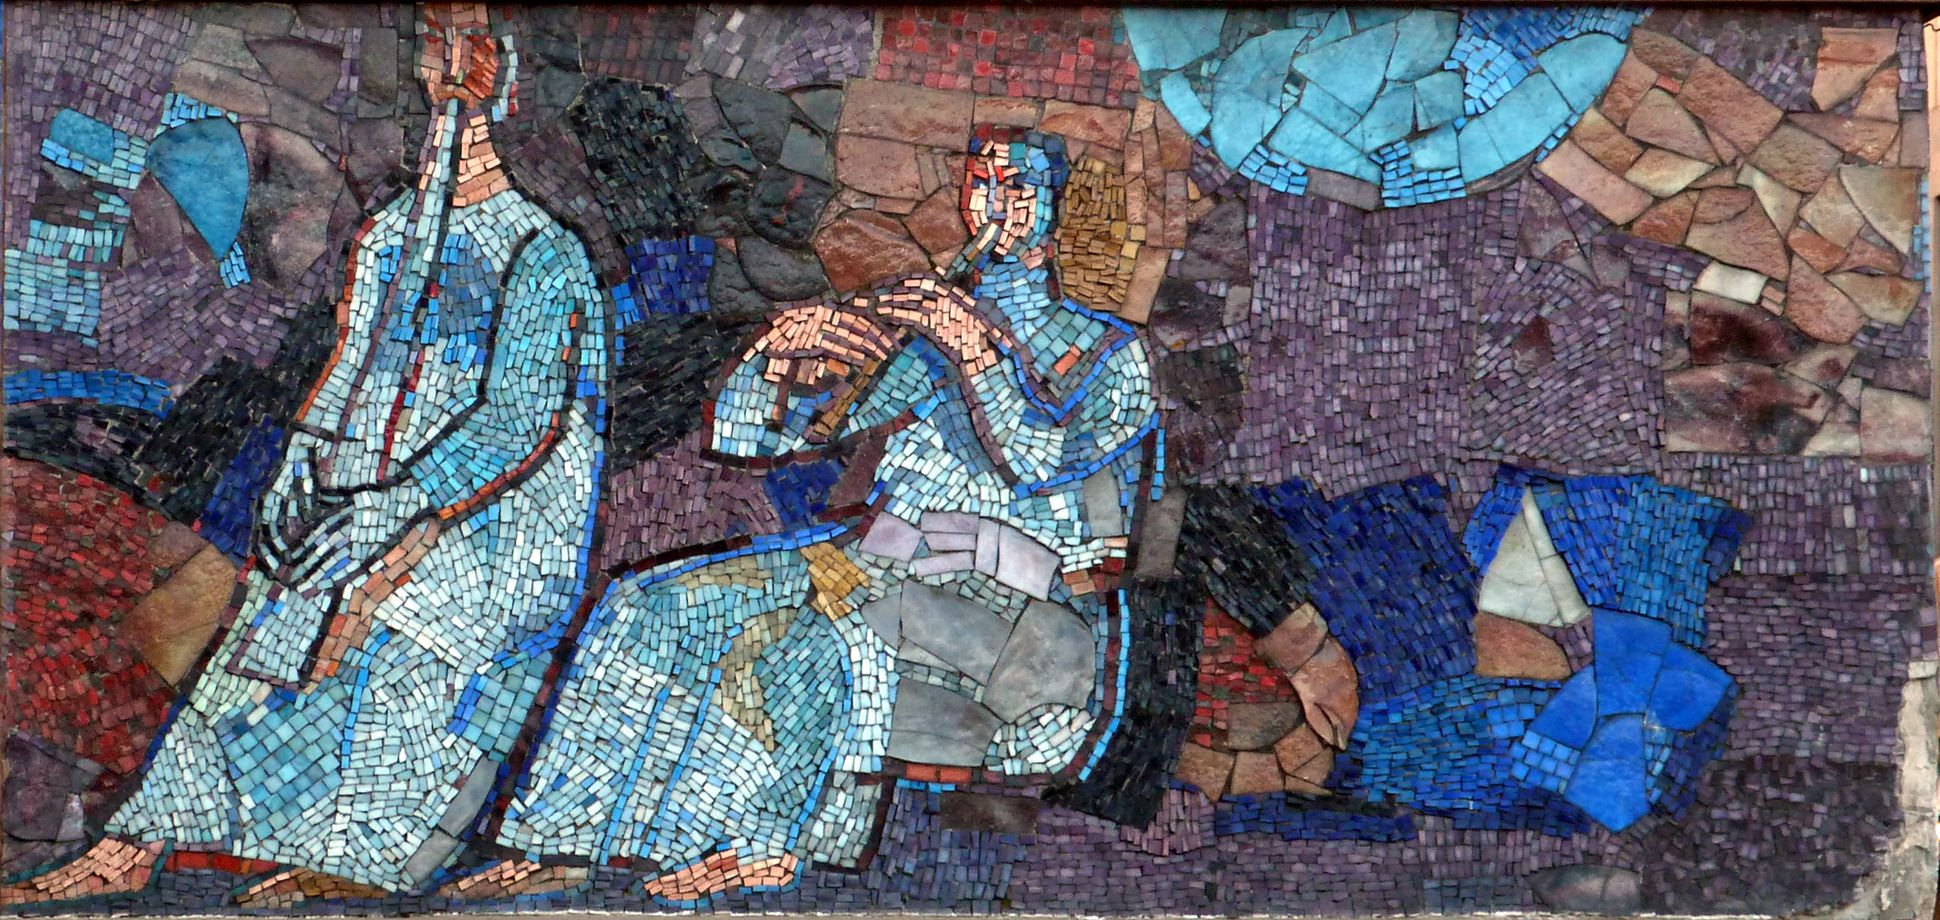 Mosaic on the Main Market (Hauptmarkt) in Nuremberg Musicians